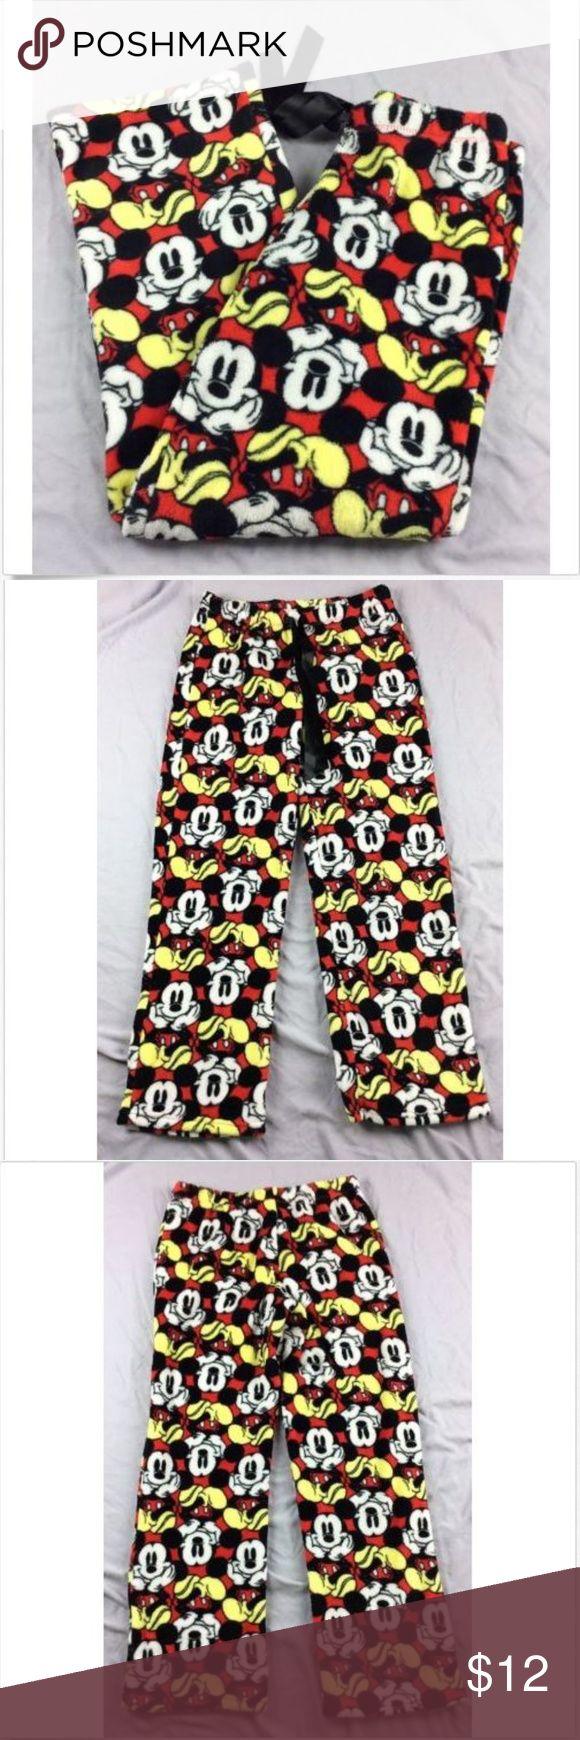 "Disney Mickey Mouse Polar Fleece Pajama Pants SM Disney Mickey Mouse pajama pants size small. Elastic drawstring waist, polar fleece  Measurements laying flat   Waist 14.5""  Hip 19""  Rise 9""  Inseam 28"" Disney Intimates & Sleepwear Pajamas"